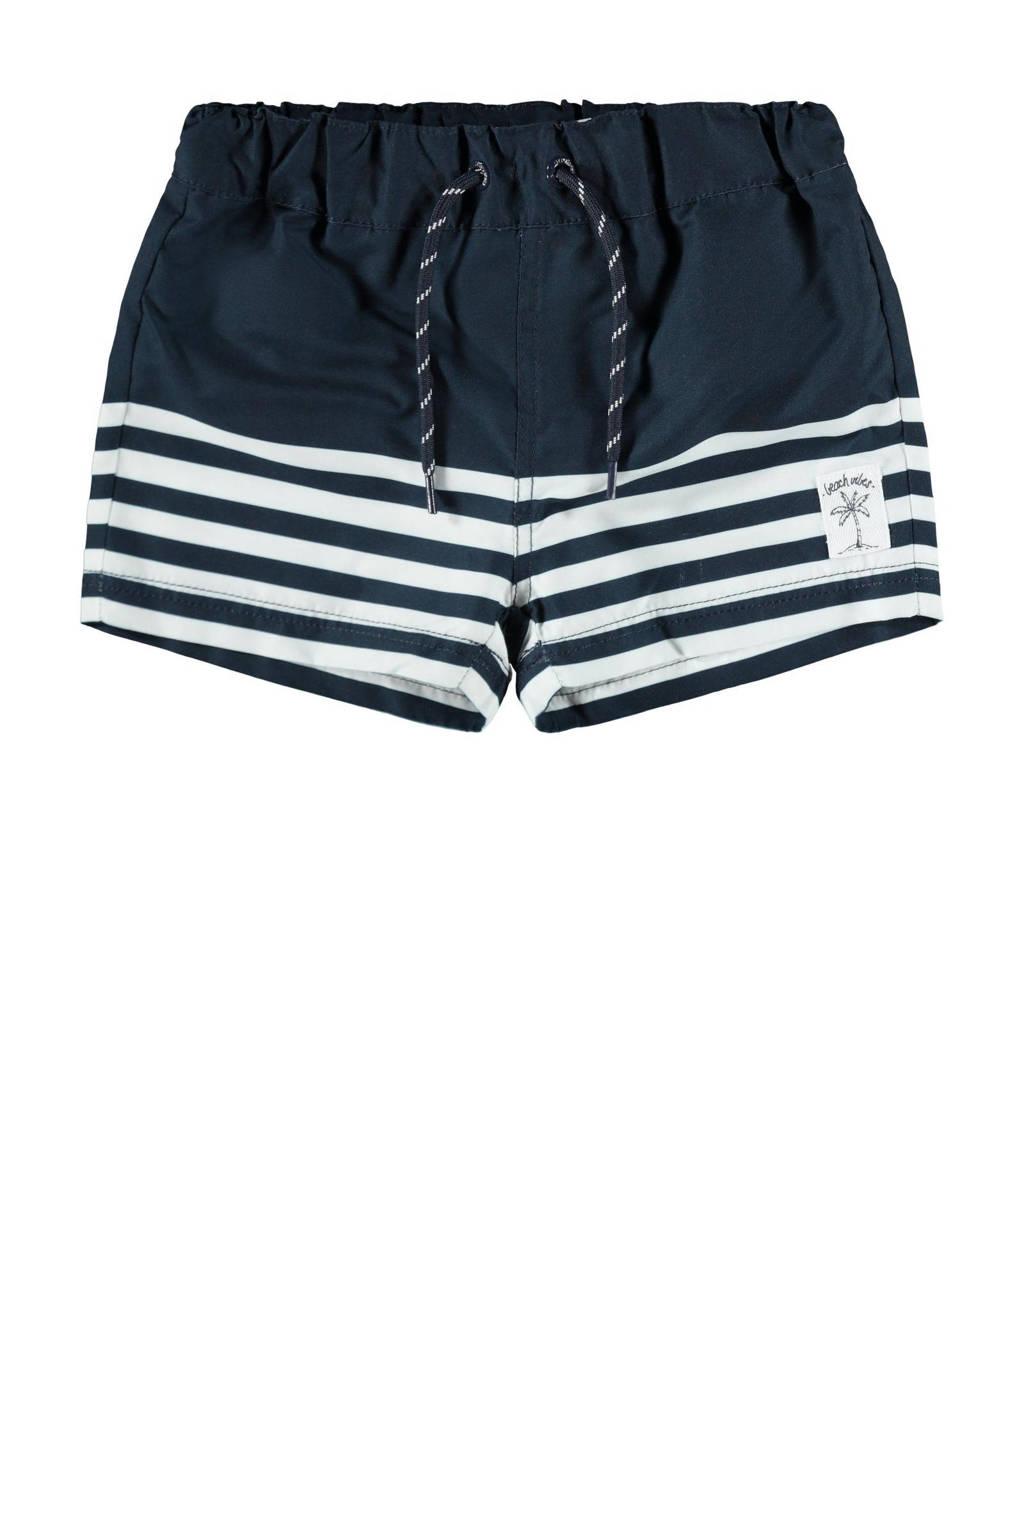 NAME IT MINI zwemshort Zimbal met strepen donkerblauw/wit, Donkerblauw/wit